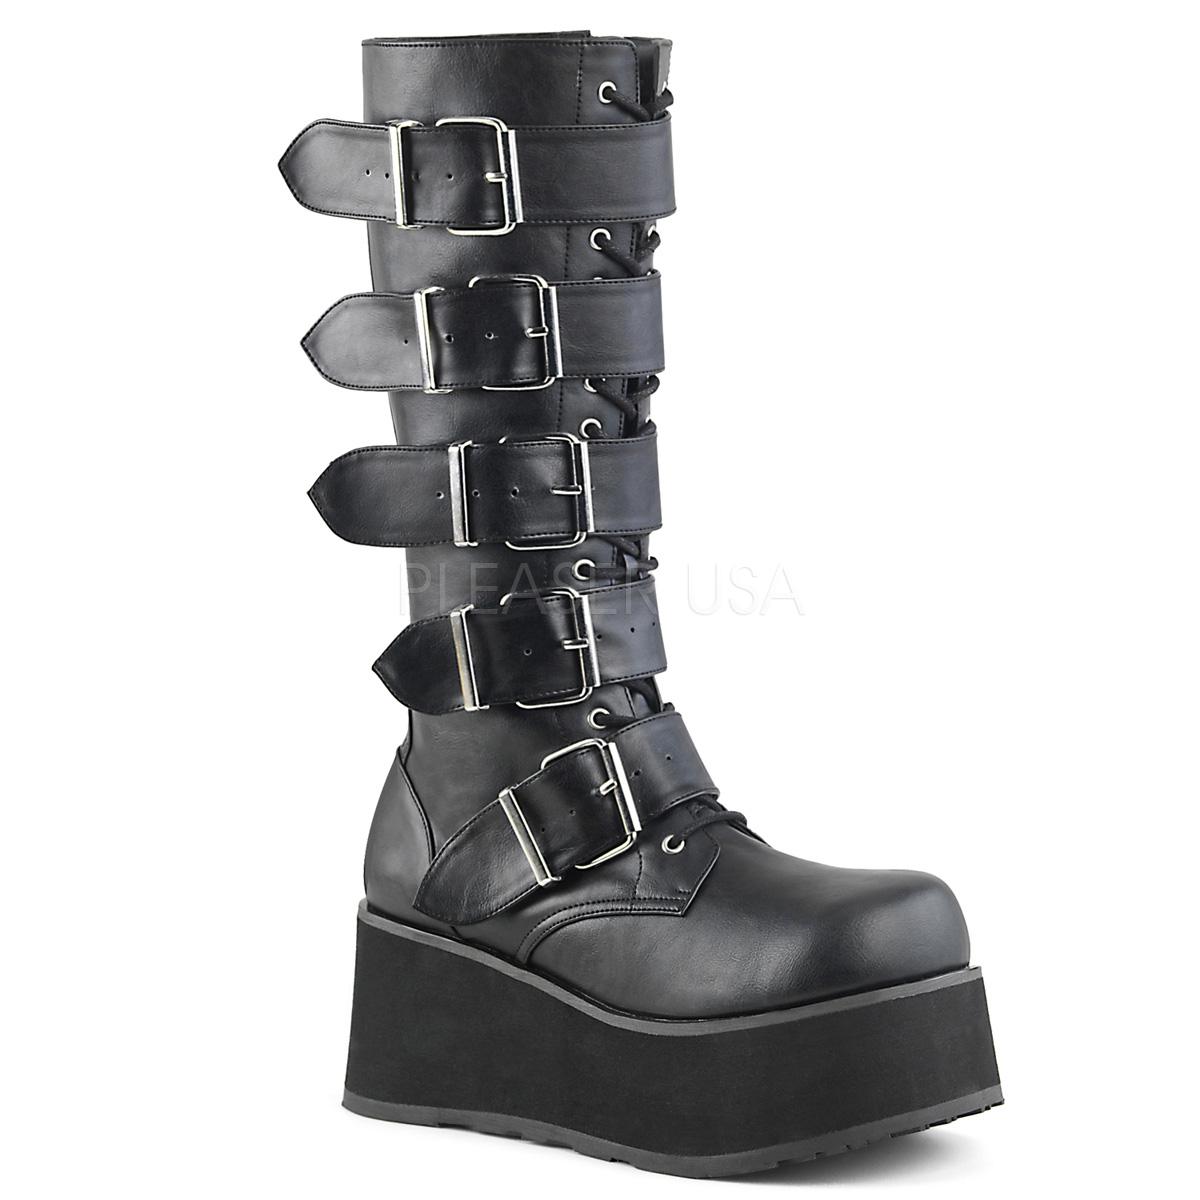 Demonia TRASHVILLE-518 3 1/4inch PF Goth Punk Knee BT 5 Buckled W/ Zipper #Men's/UNISEX ◆取り寄せ